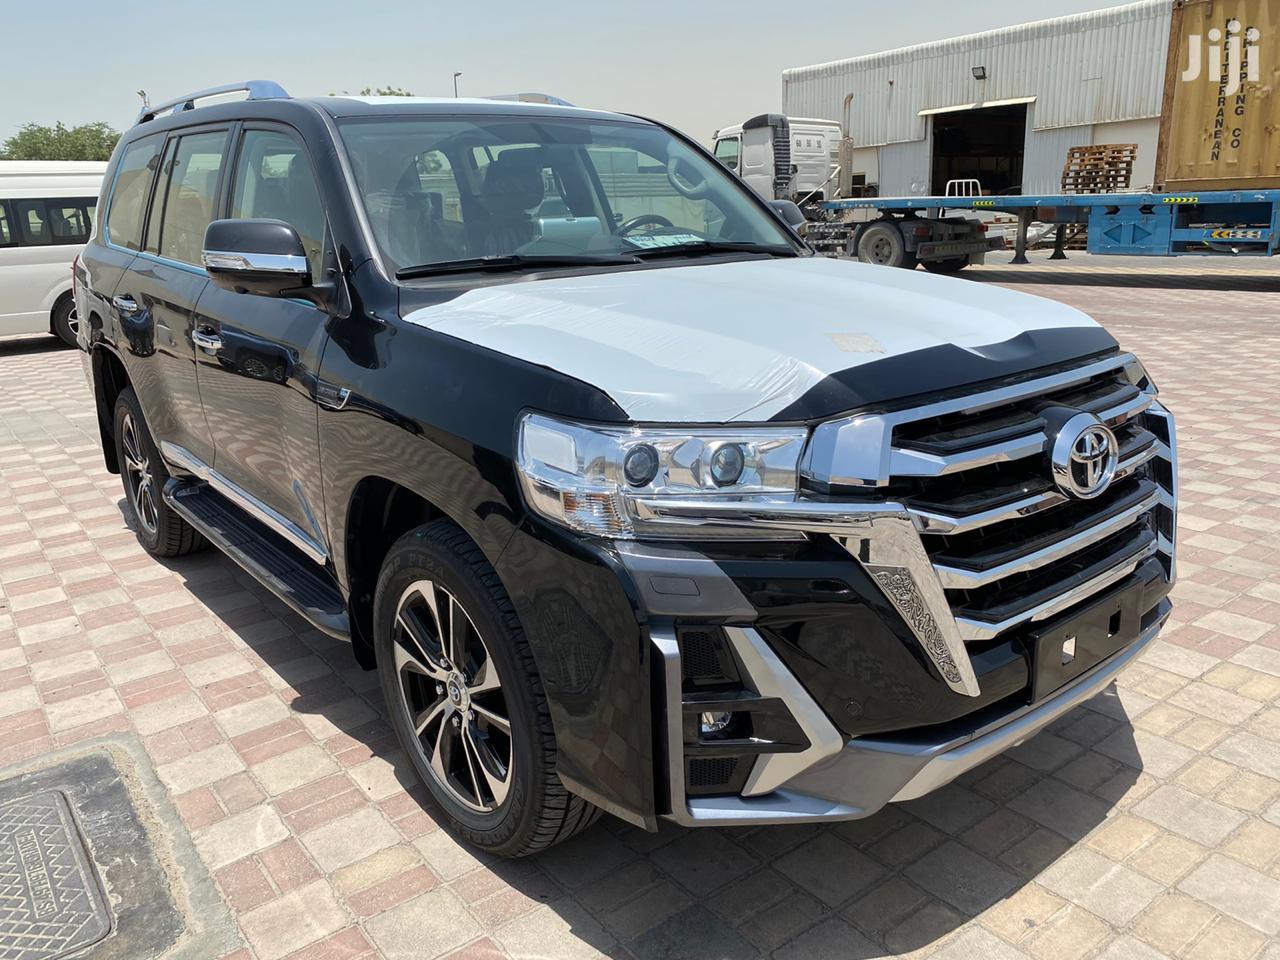 New Toyota Land Cruiser 2020 Black In East Legon Cars Dubai Auto Trading Ltd Ghana Jiji Com Gh For Sale In East Legon Buy Cars From Dubai Auto Trading Ltd Ghana On Jiji Com Gh